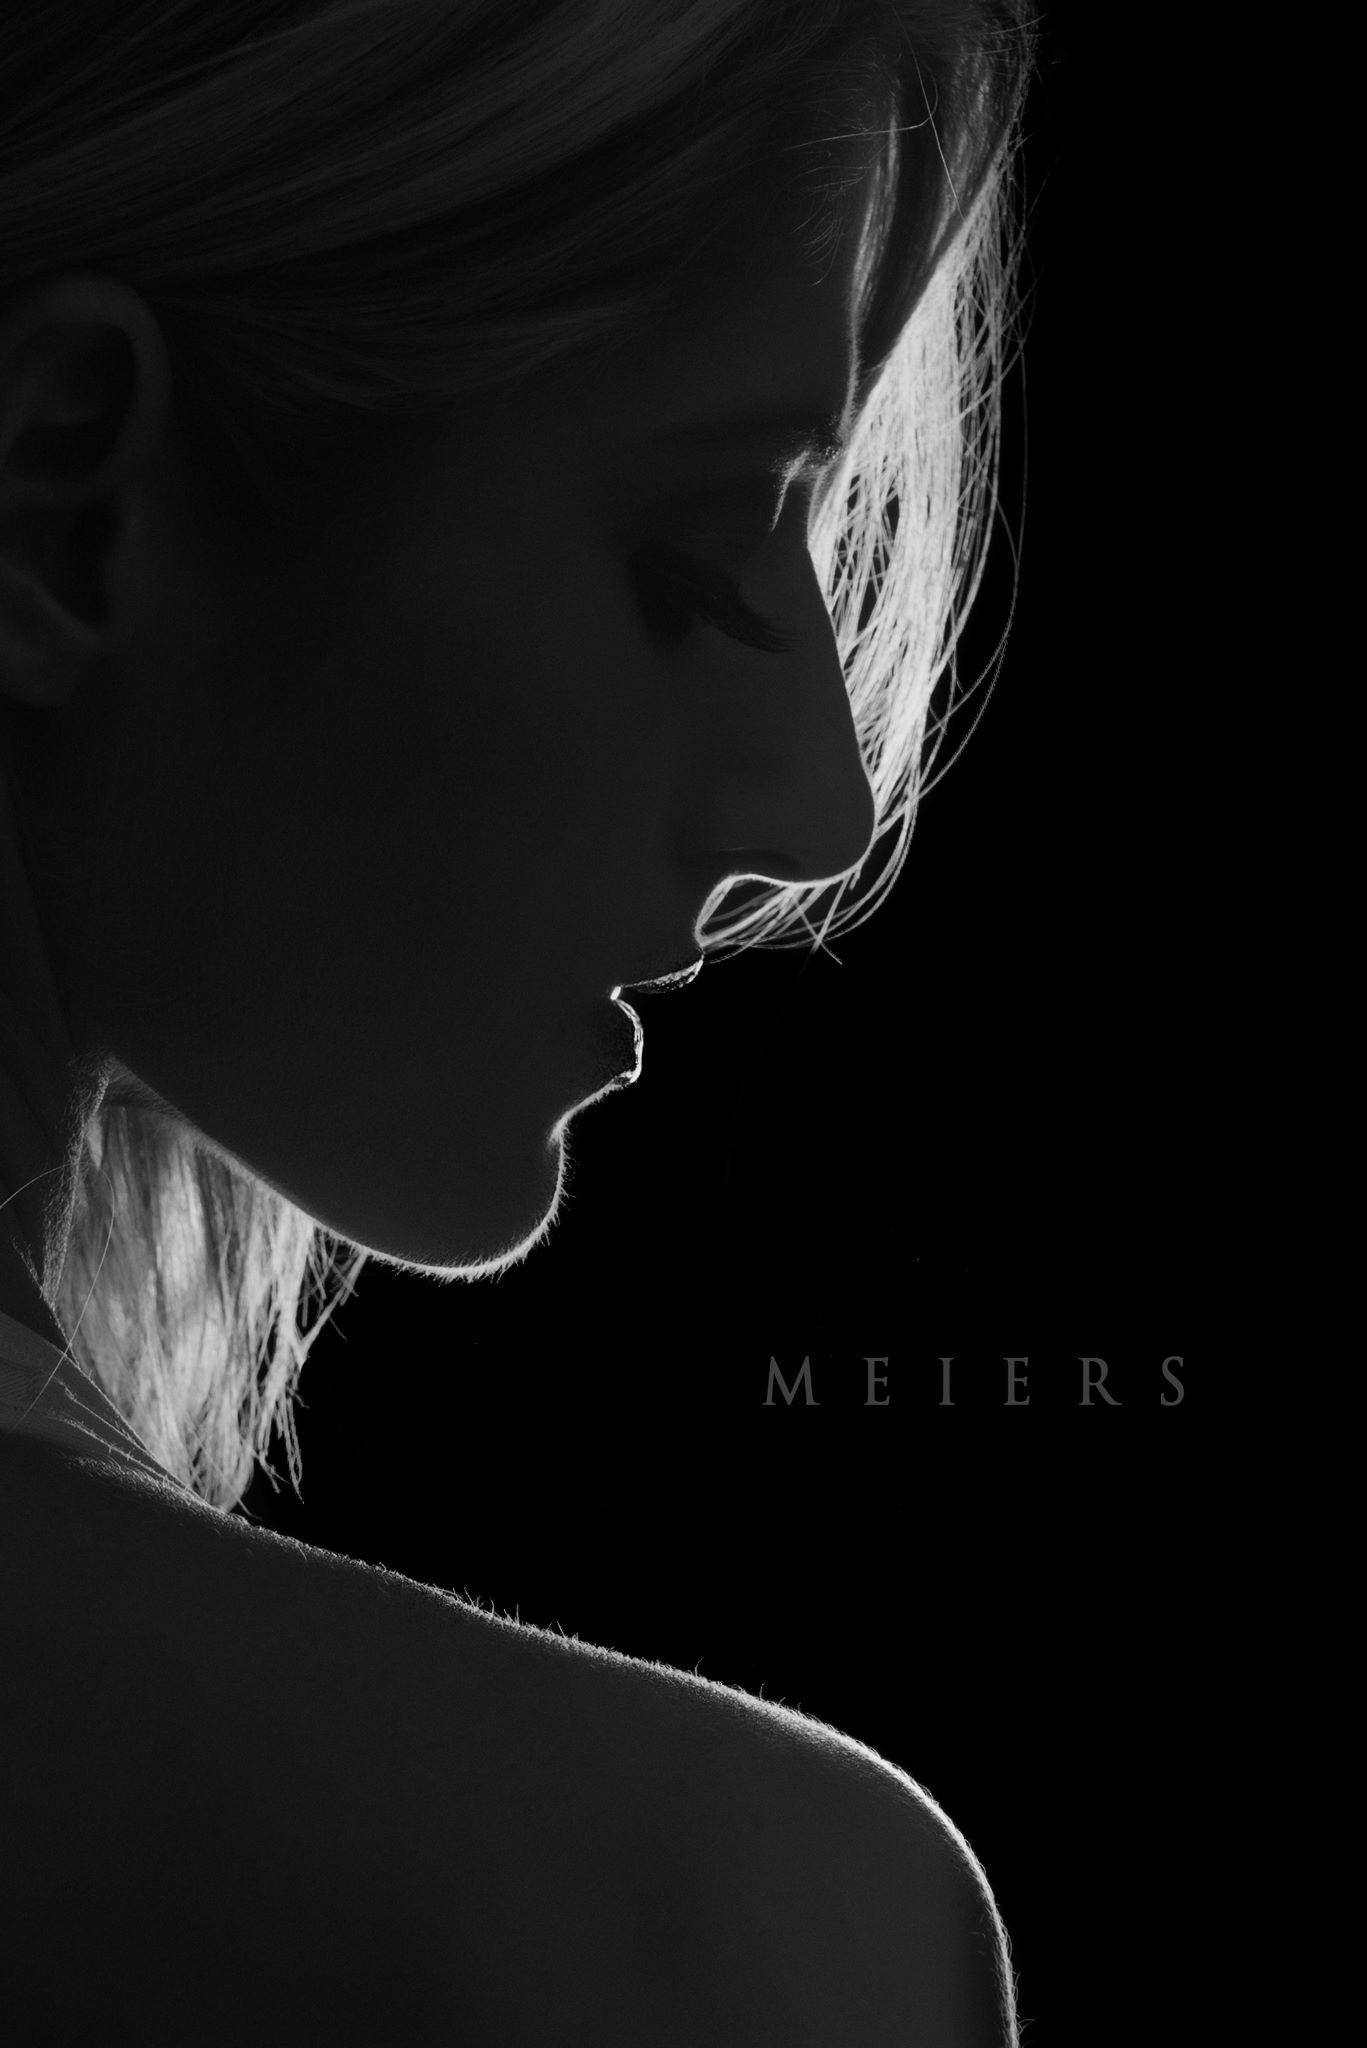 matt-meiers-fine-art-bodyscape-black-and-white-fitness-pittsburgh-photography-photographer-5.jpg